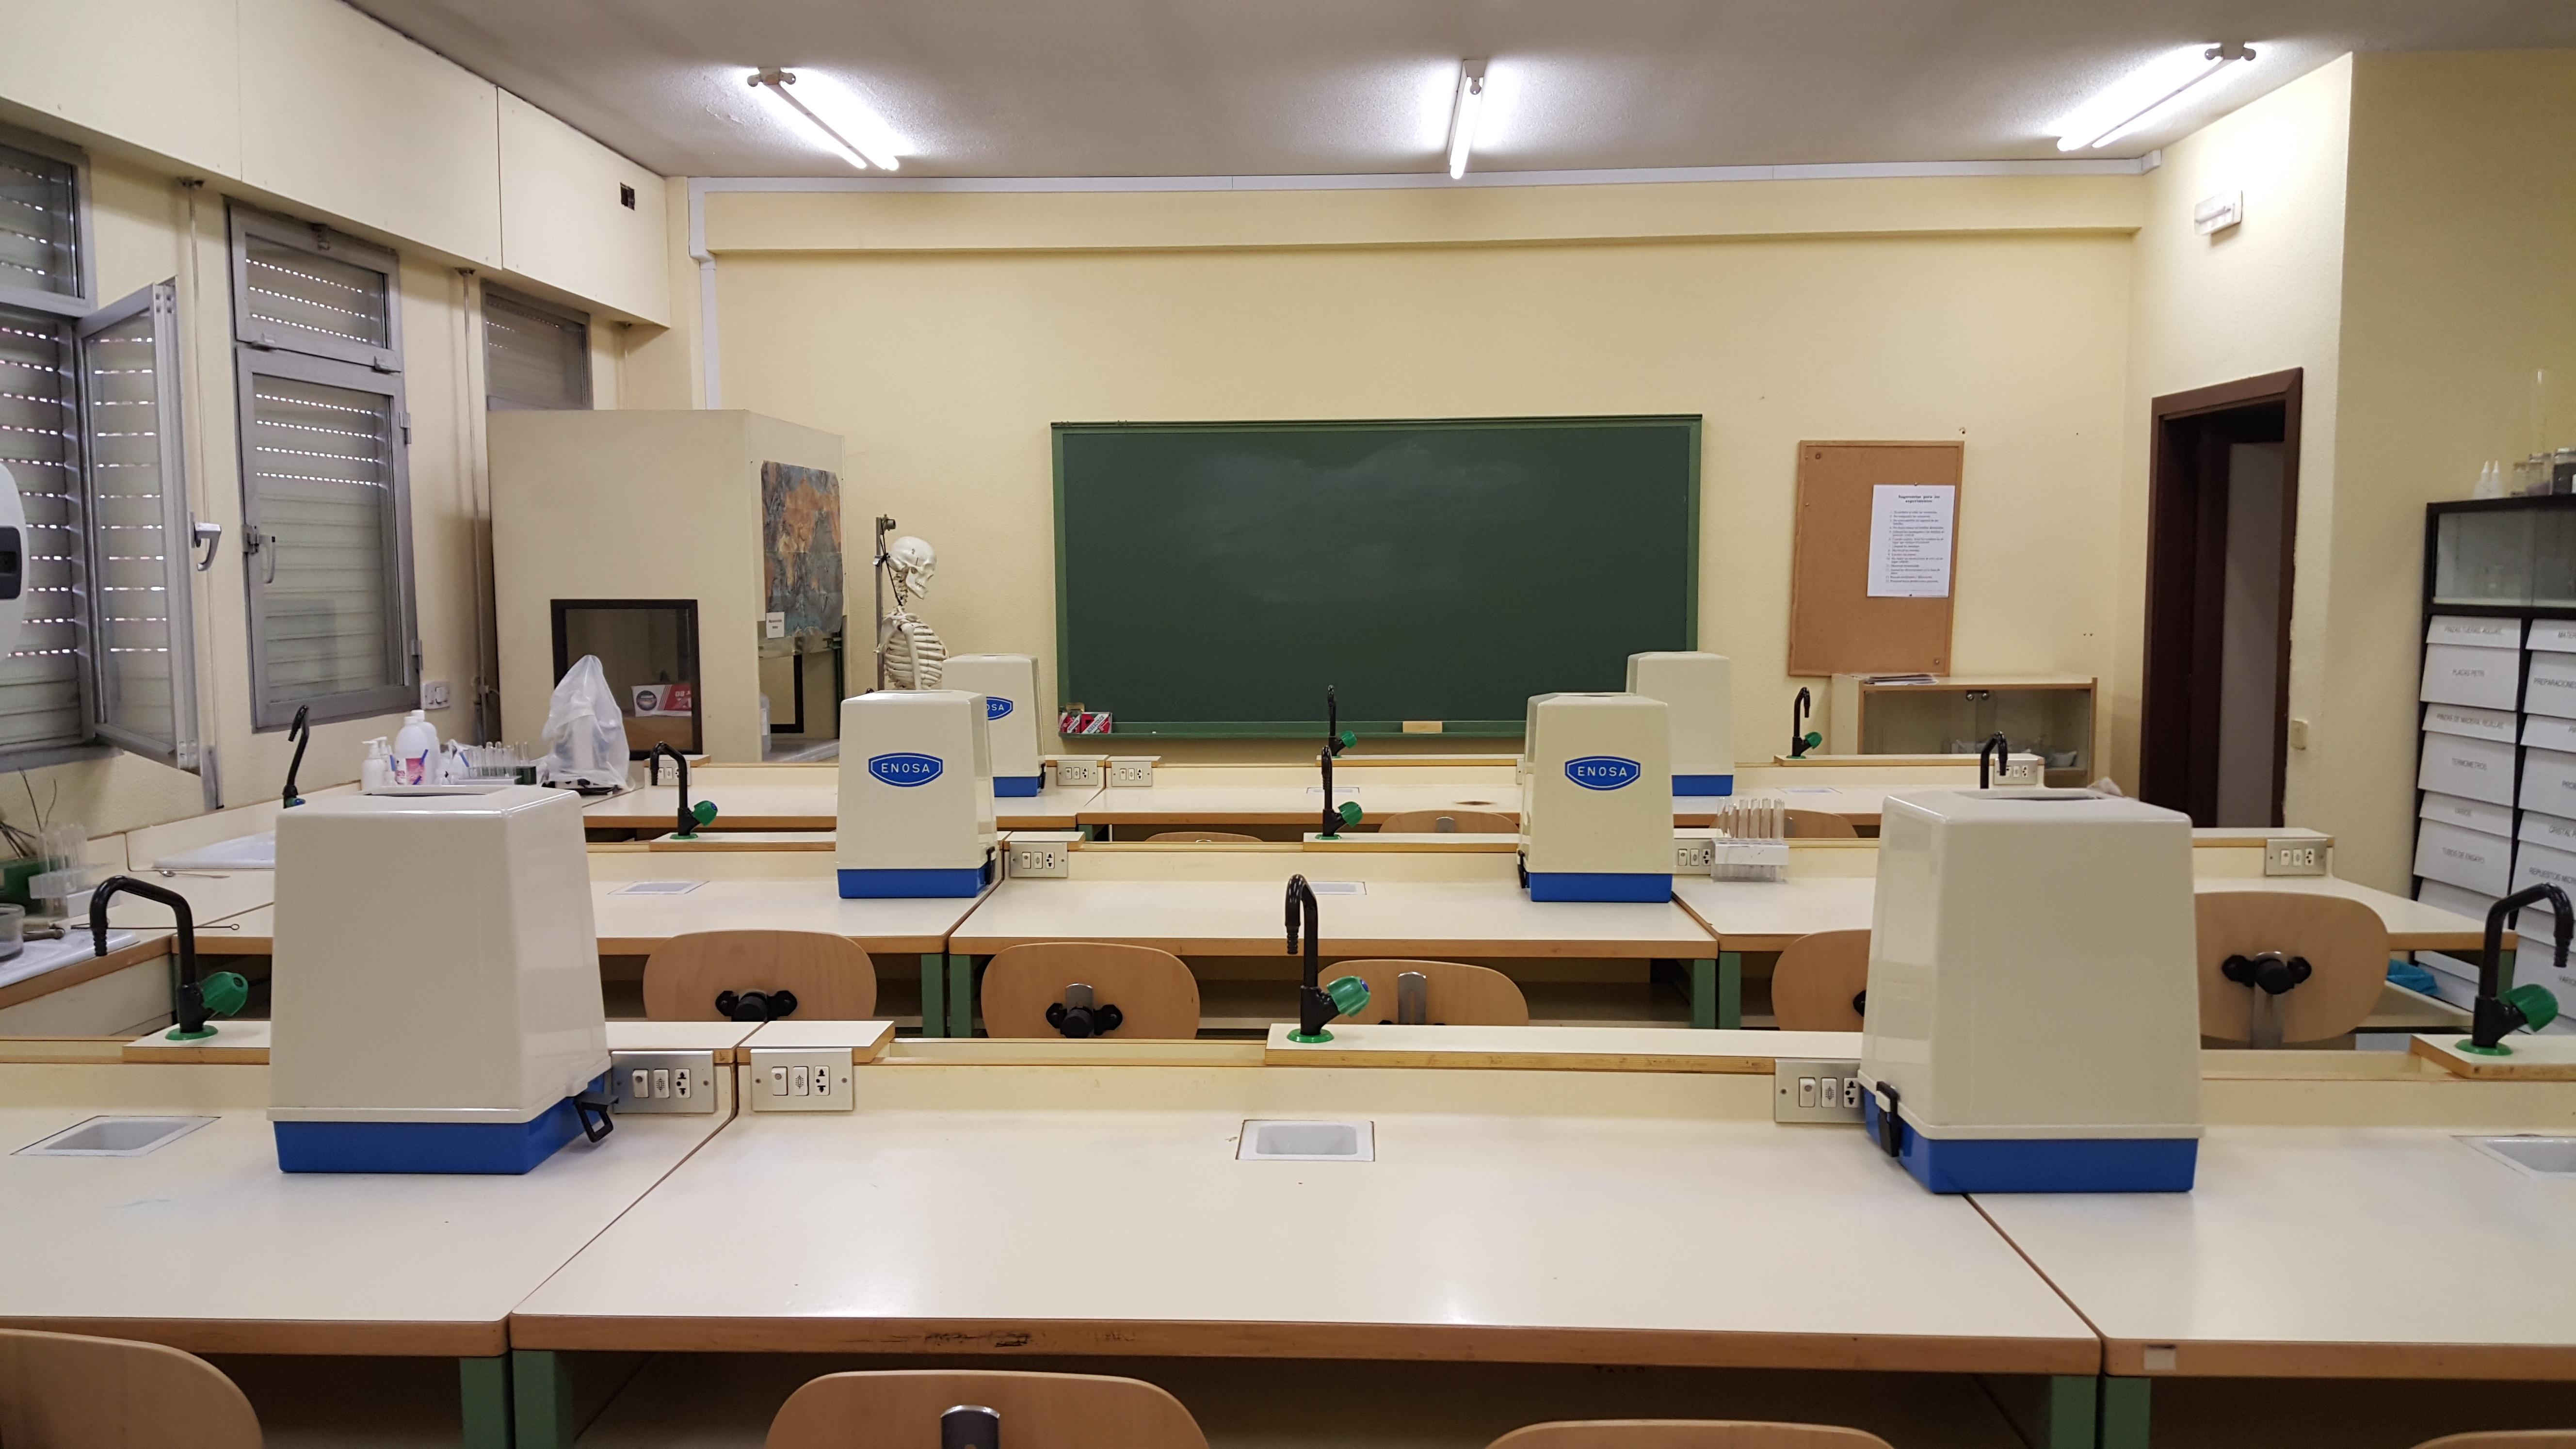 Classroom Lab Design ~ 무료 이미지 사무실 방 교실 디자인 슬레이트 연구 학교 수업 랩 회의장